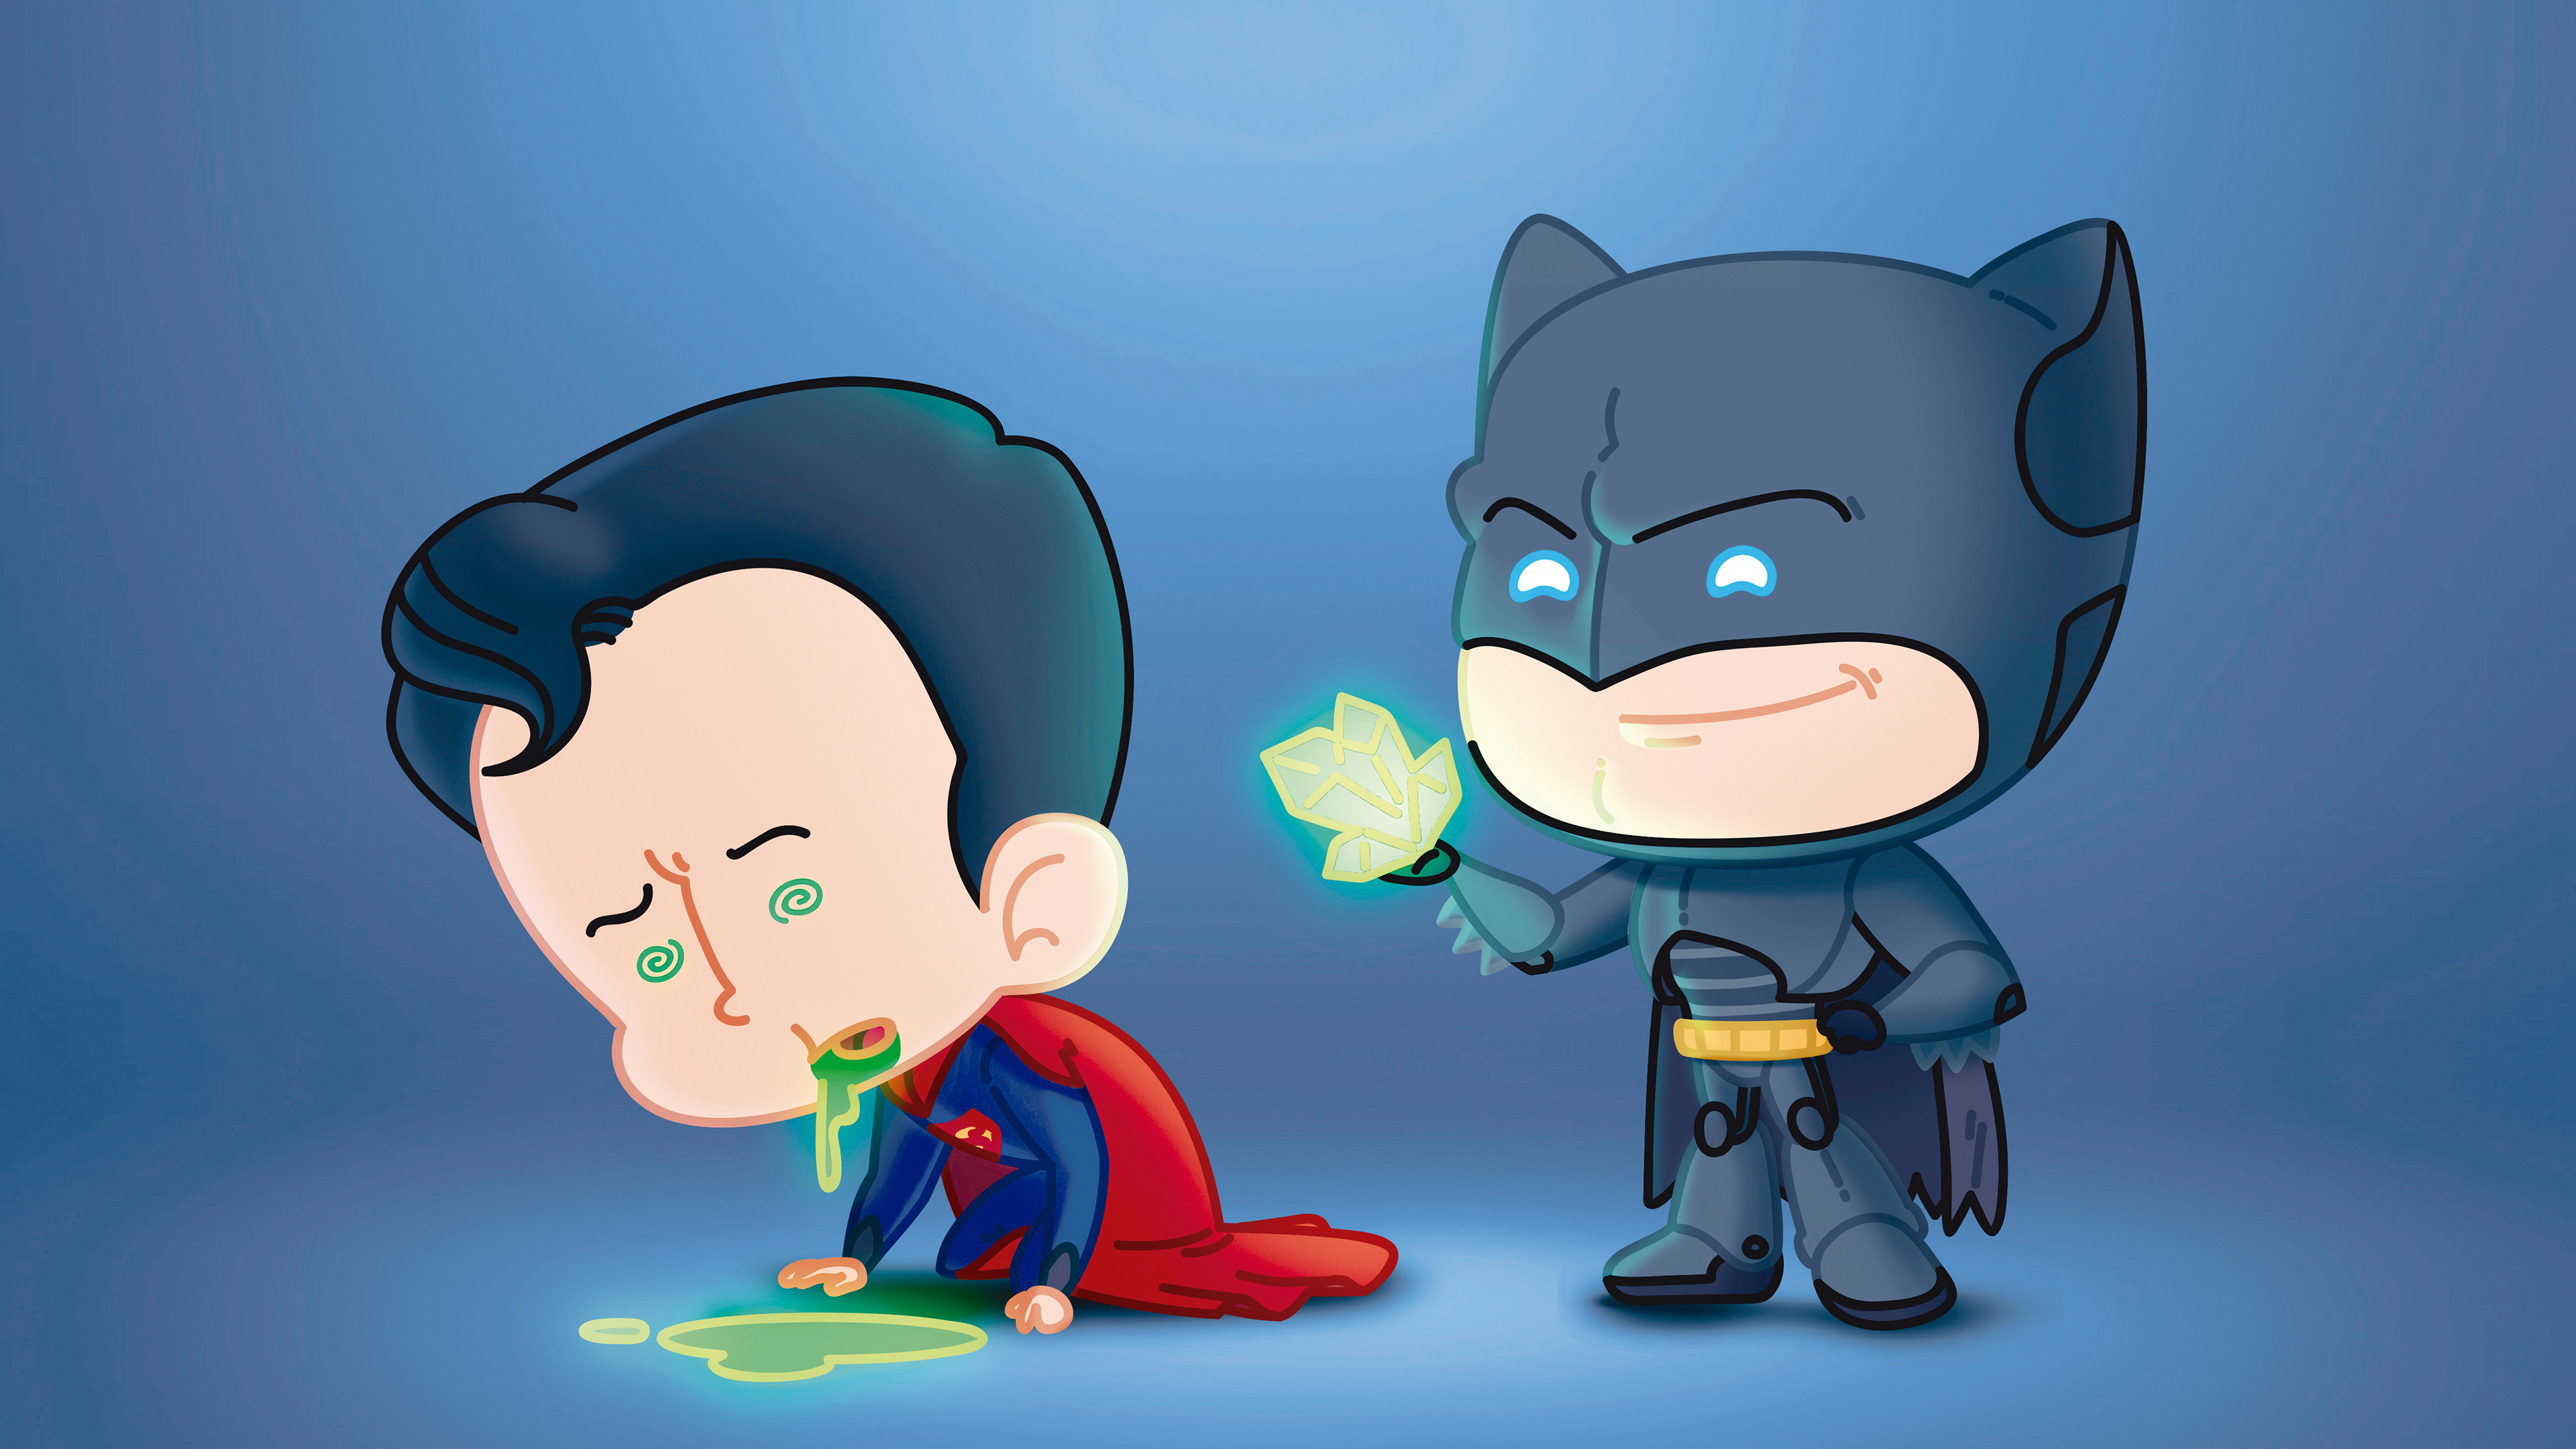 batman and superman fat heads 1543620077 - Batman And Superman Fat Heads - supervillain wallpapers, superman wallpapers, superheroes wallpapers, hd-wallpapers, digital art wallpapers, behance wallpapers, batman wallpapers, artwork wallpapers, artist wallpapers, 4k-wallpapers